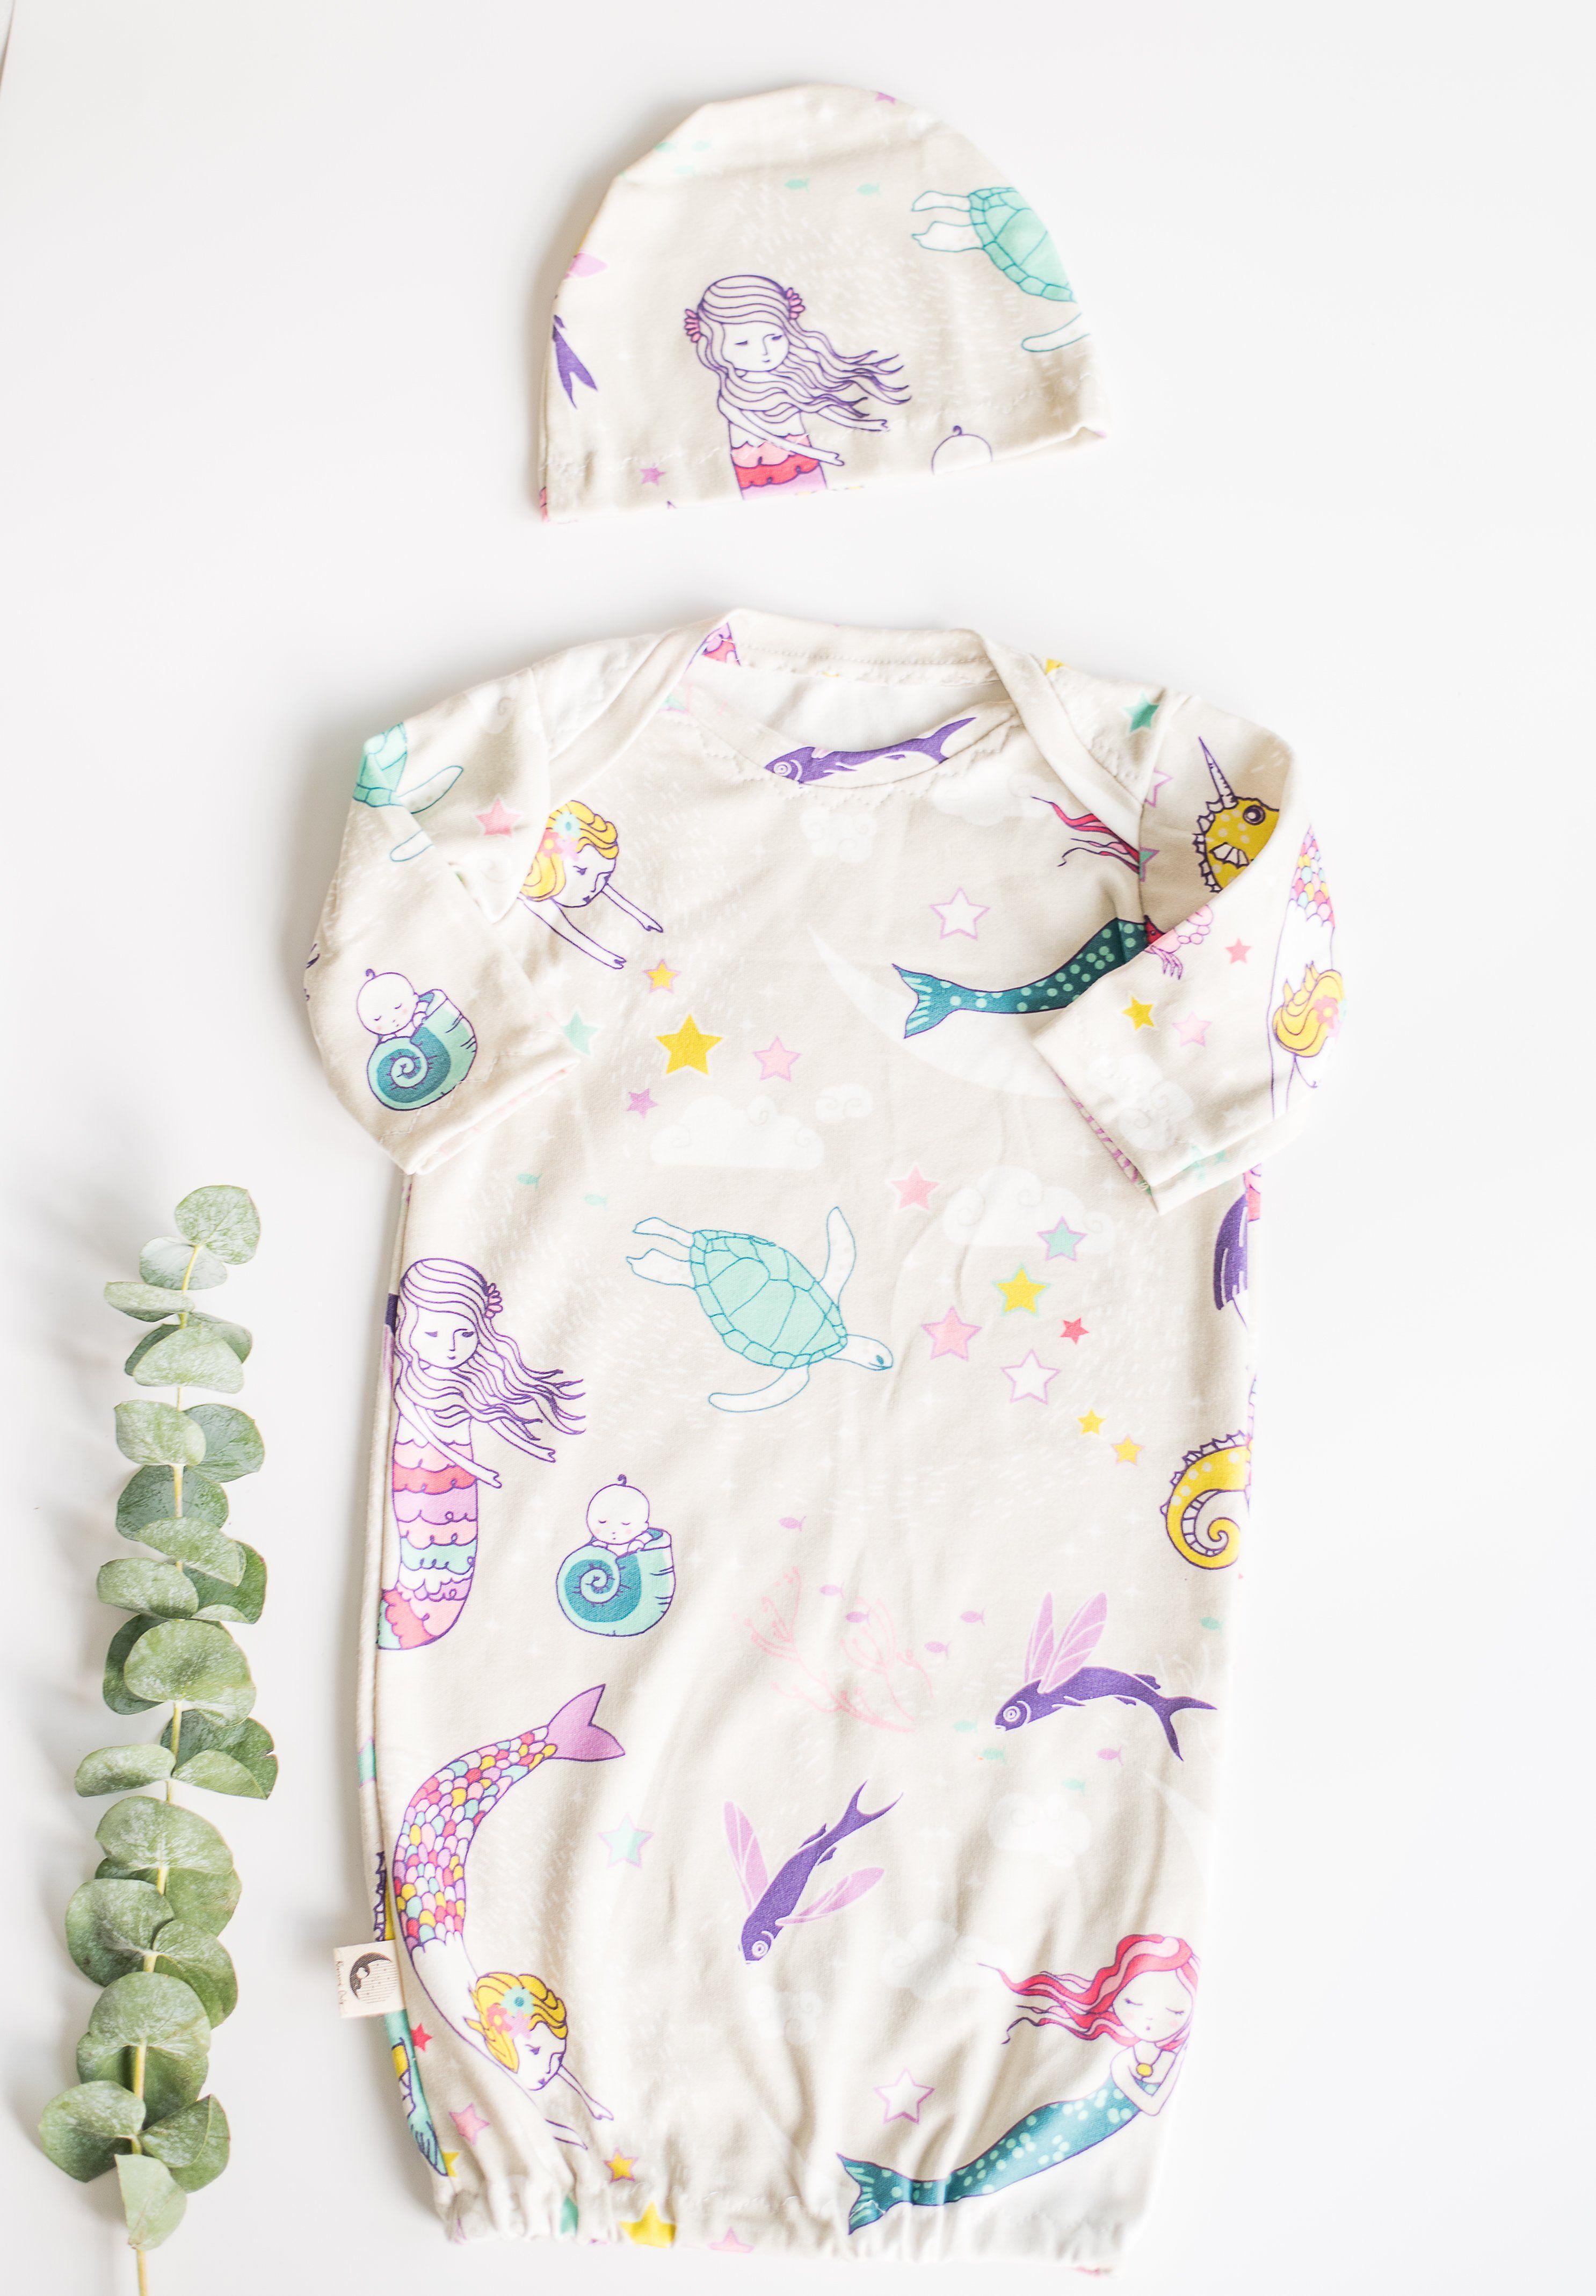 NEWBORN SLEEPER GOWN WITH MATCHING HAT - MERMAID   Baby idea\'s ...